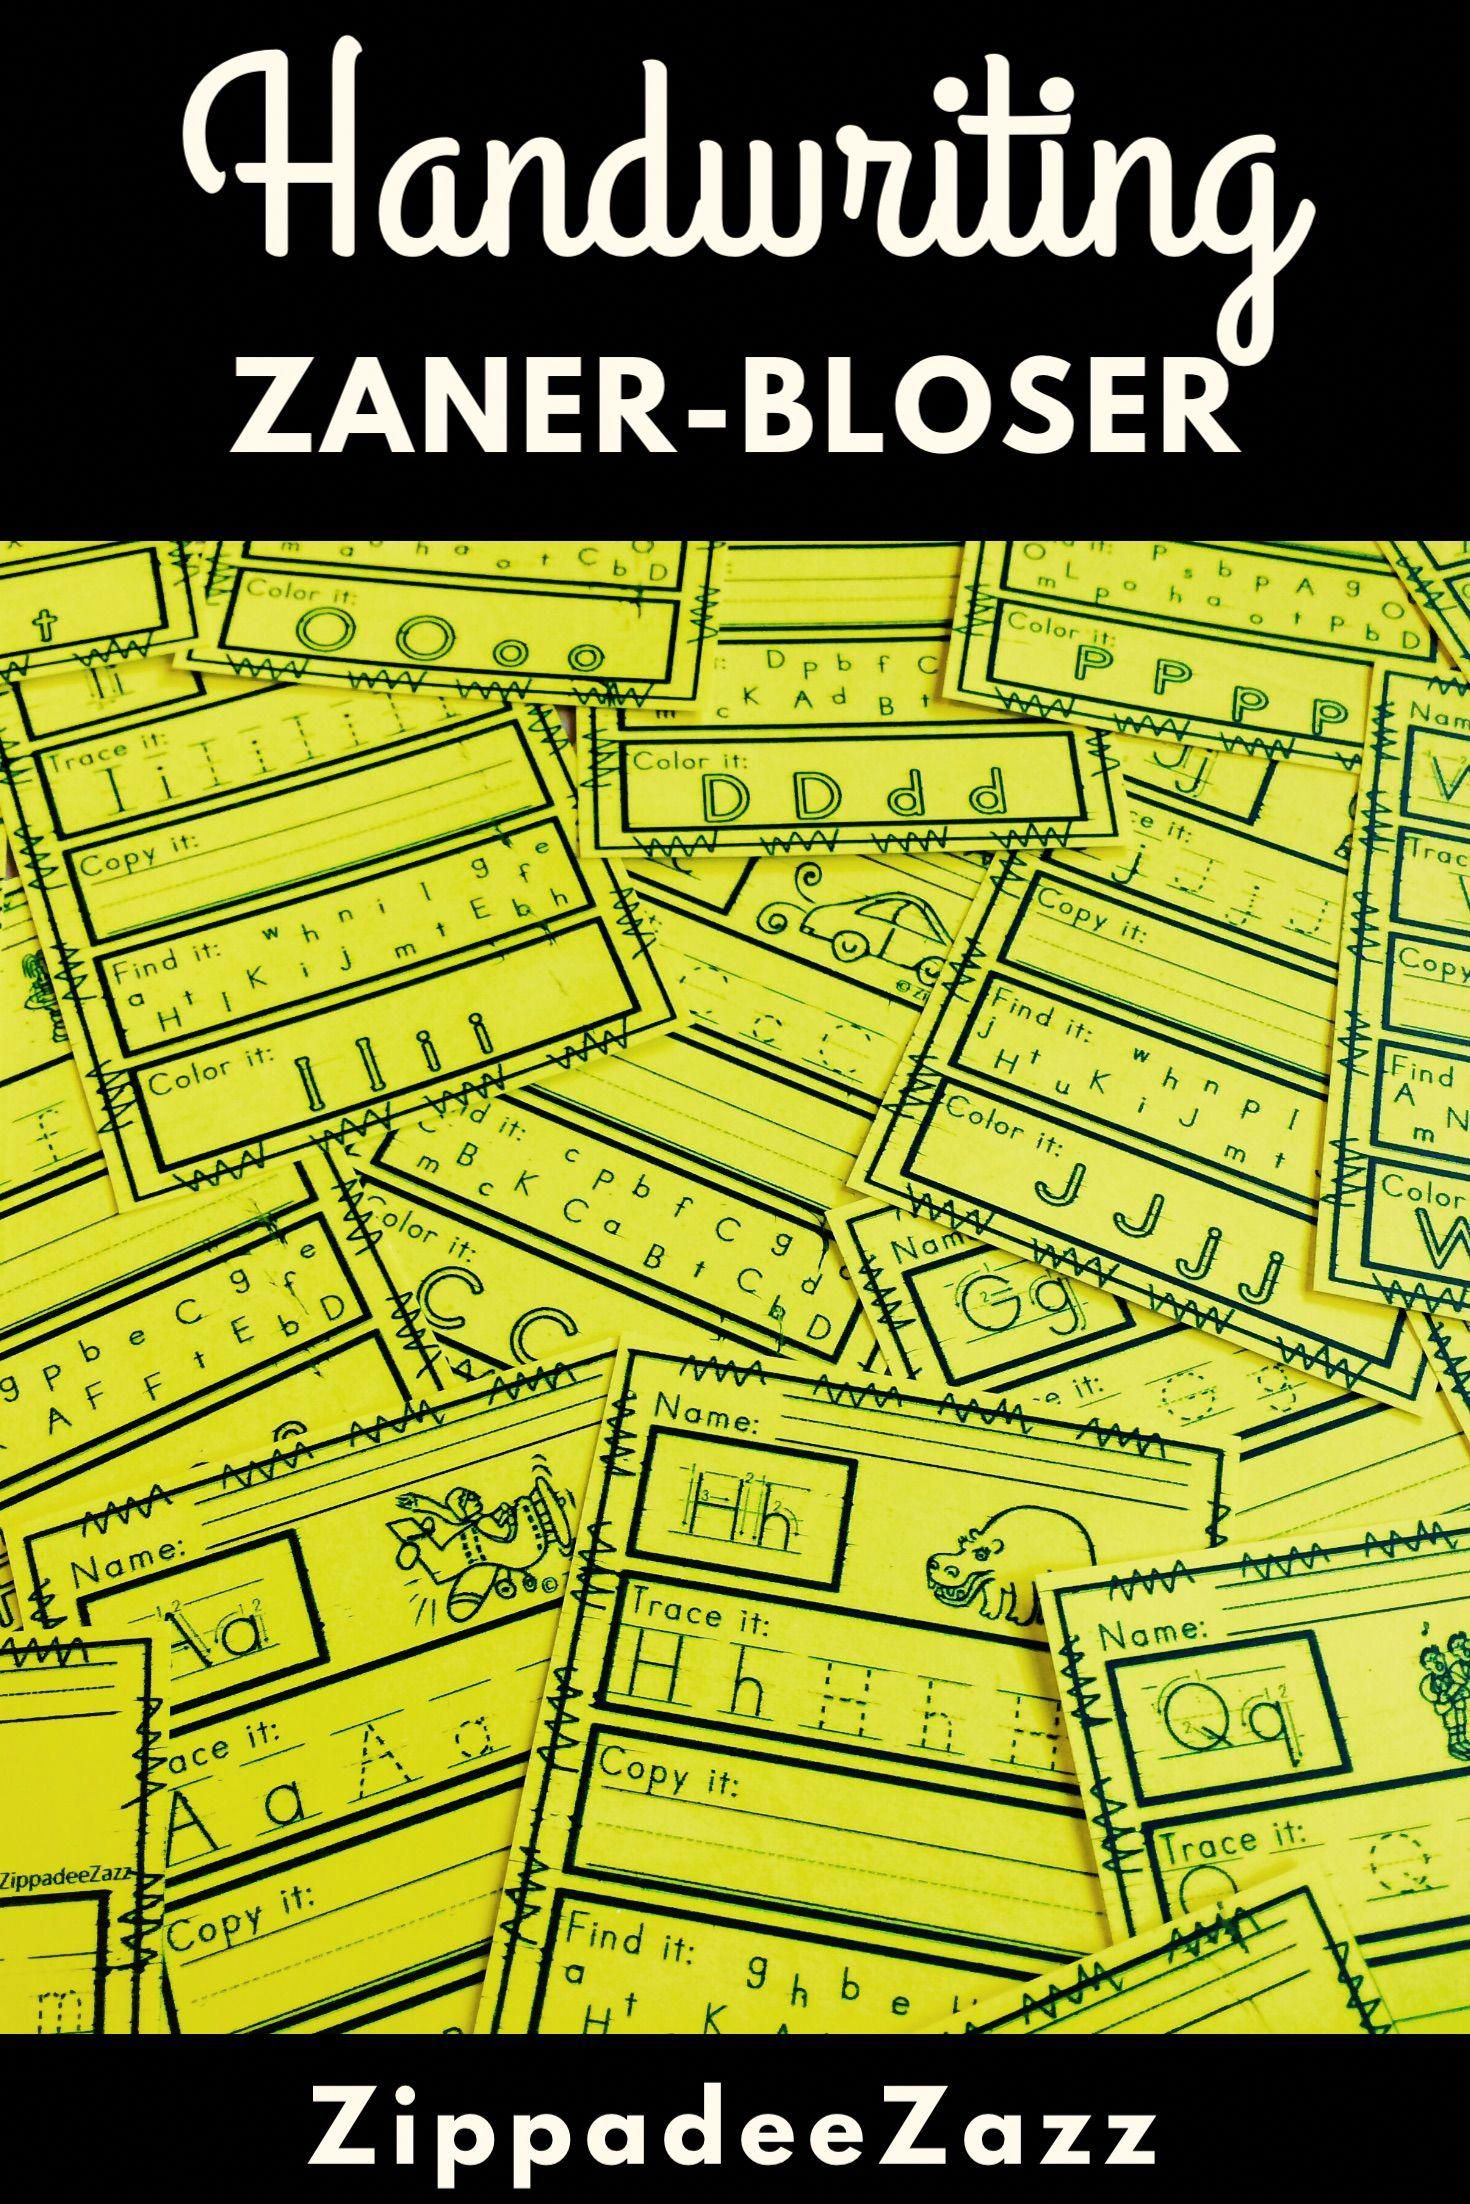 Improve Hand Writing Improvehandwriting Handwriting Practice Handwriting Zaner Bloser Handwriting [ 2204 x 1470 Pixel ]